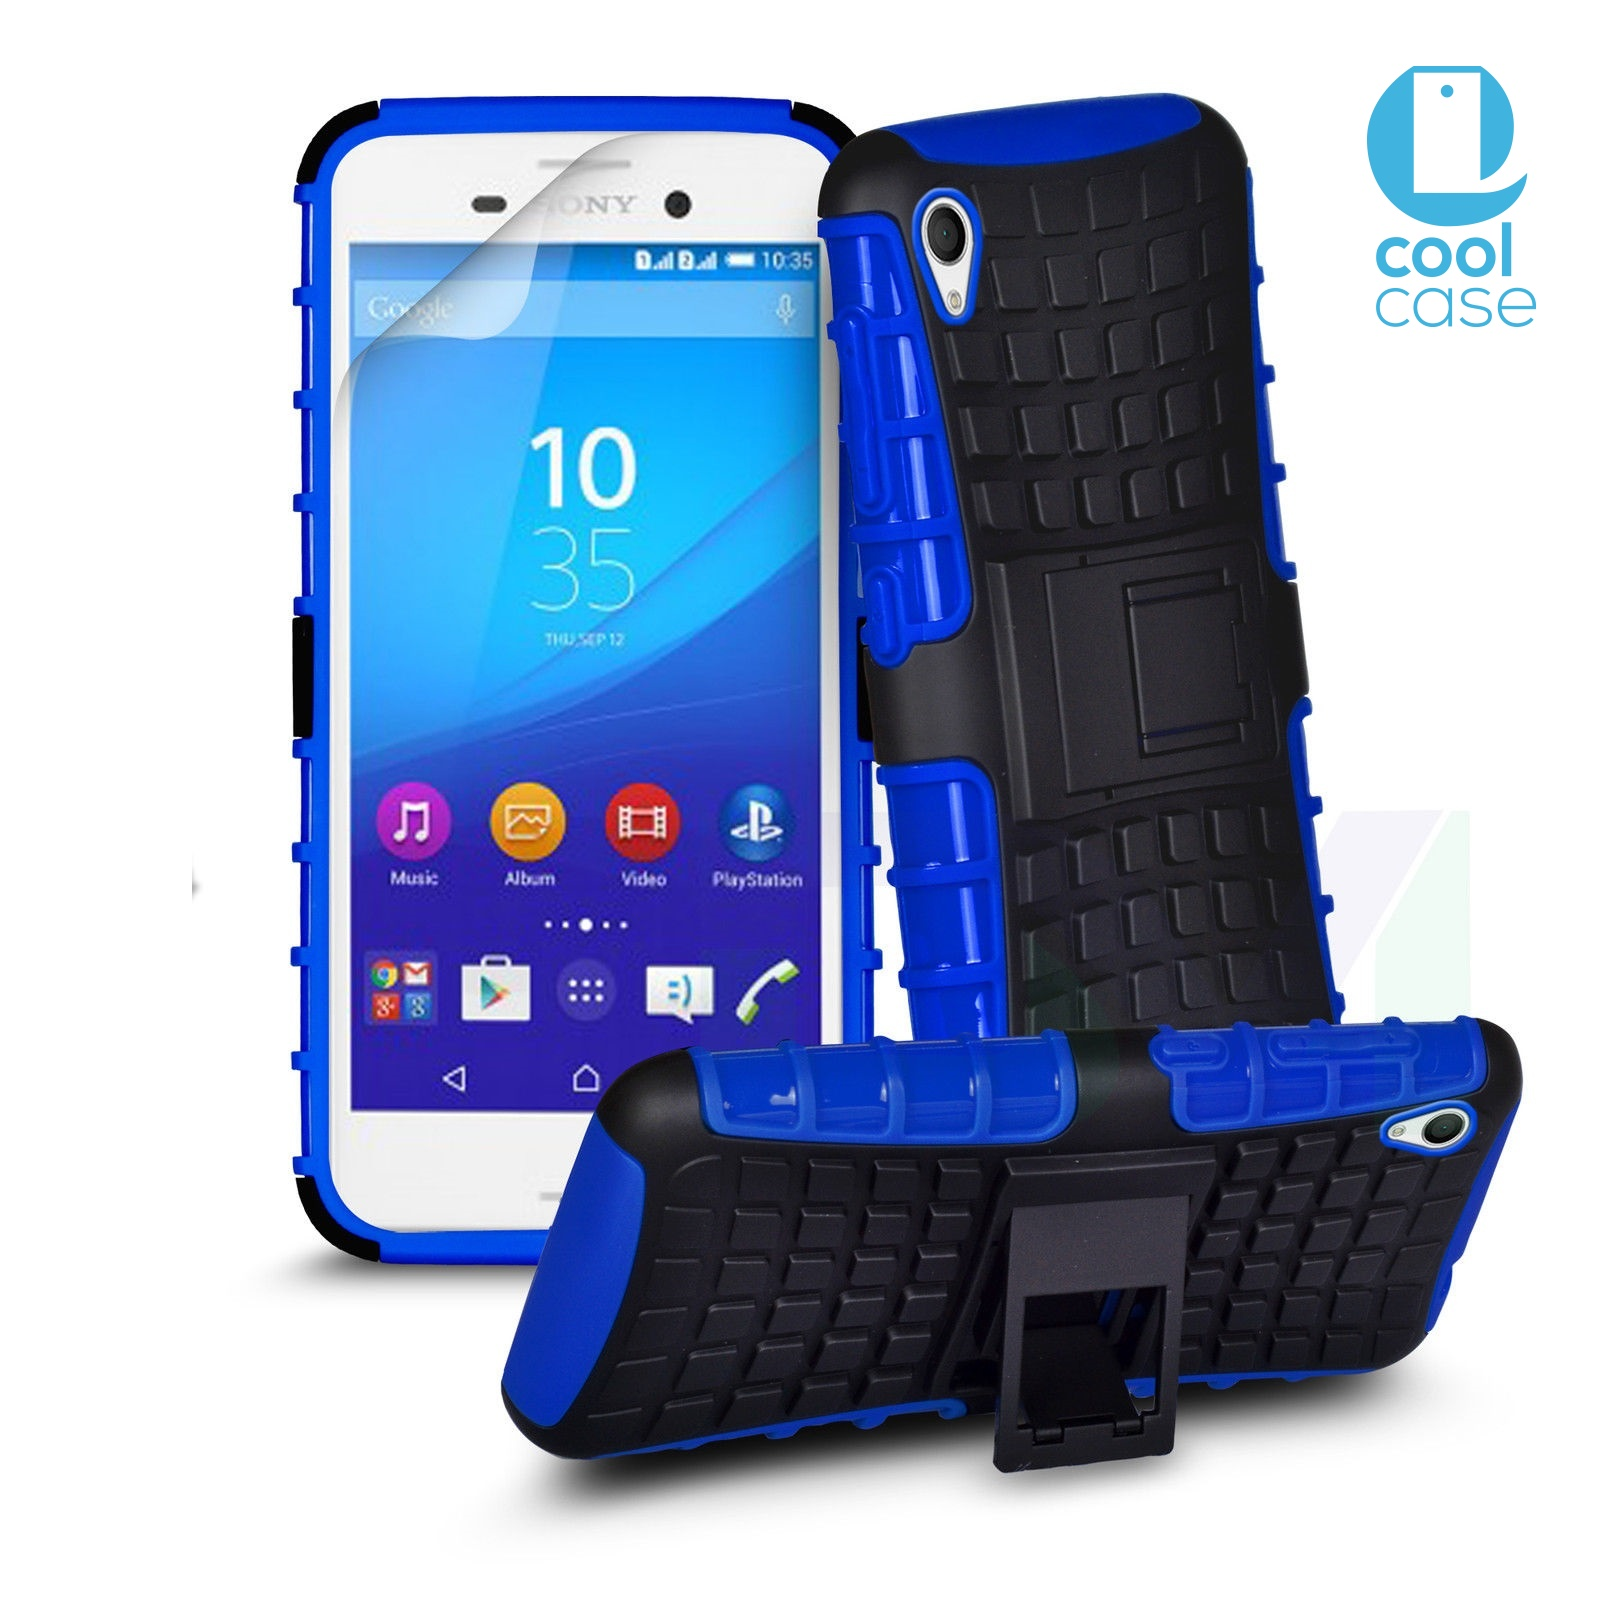 Odolné pouzdro PANZER CASE na mobilní telefon Sony Xperia Z5 Compact Modré (Odolný kryt či obal na mobil Sony Xperia Z5 Compact se stojánkem)